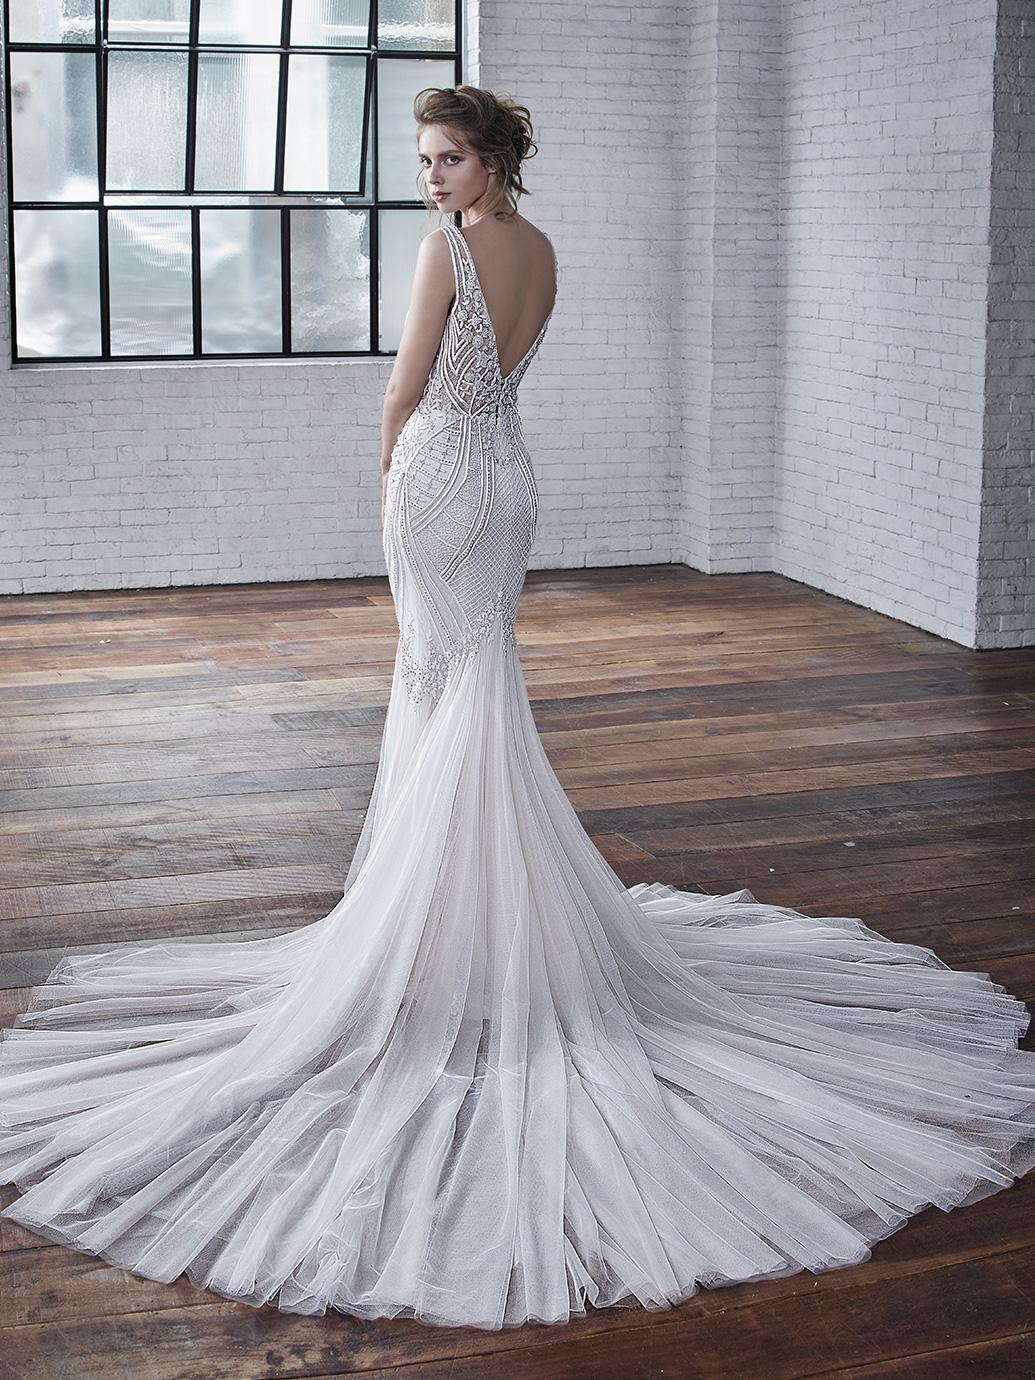 BM_Bride_2019_Pro_Charlize_Bac_Web.jpg